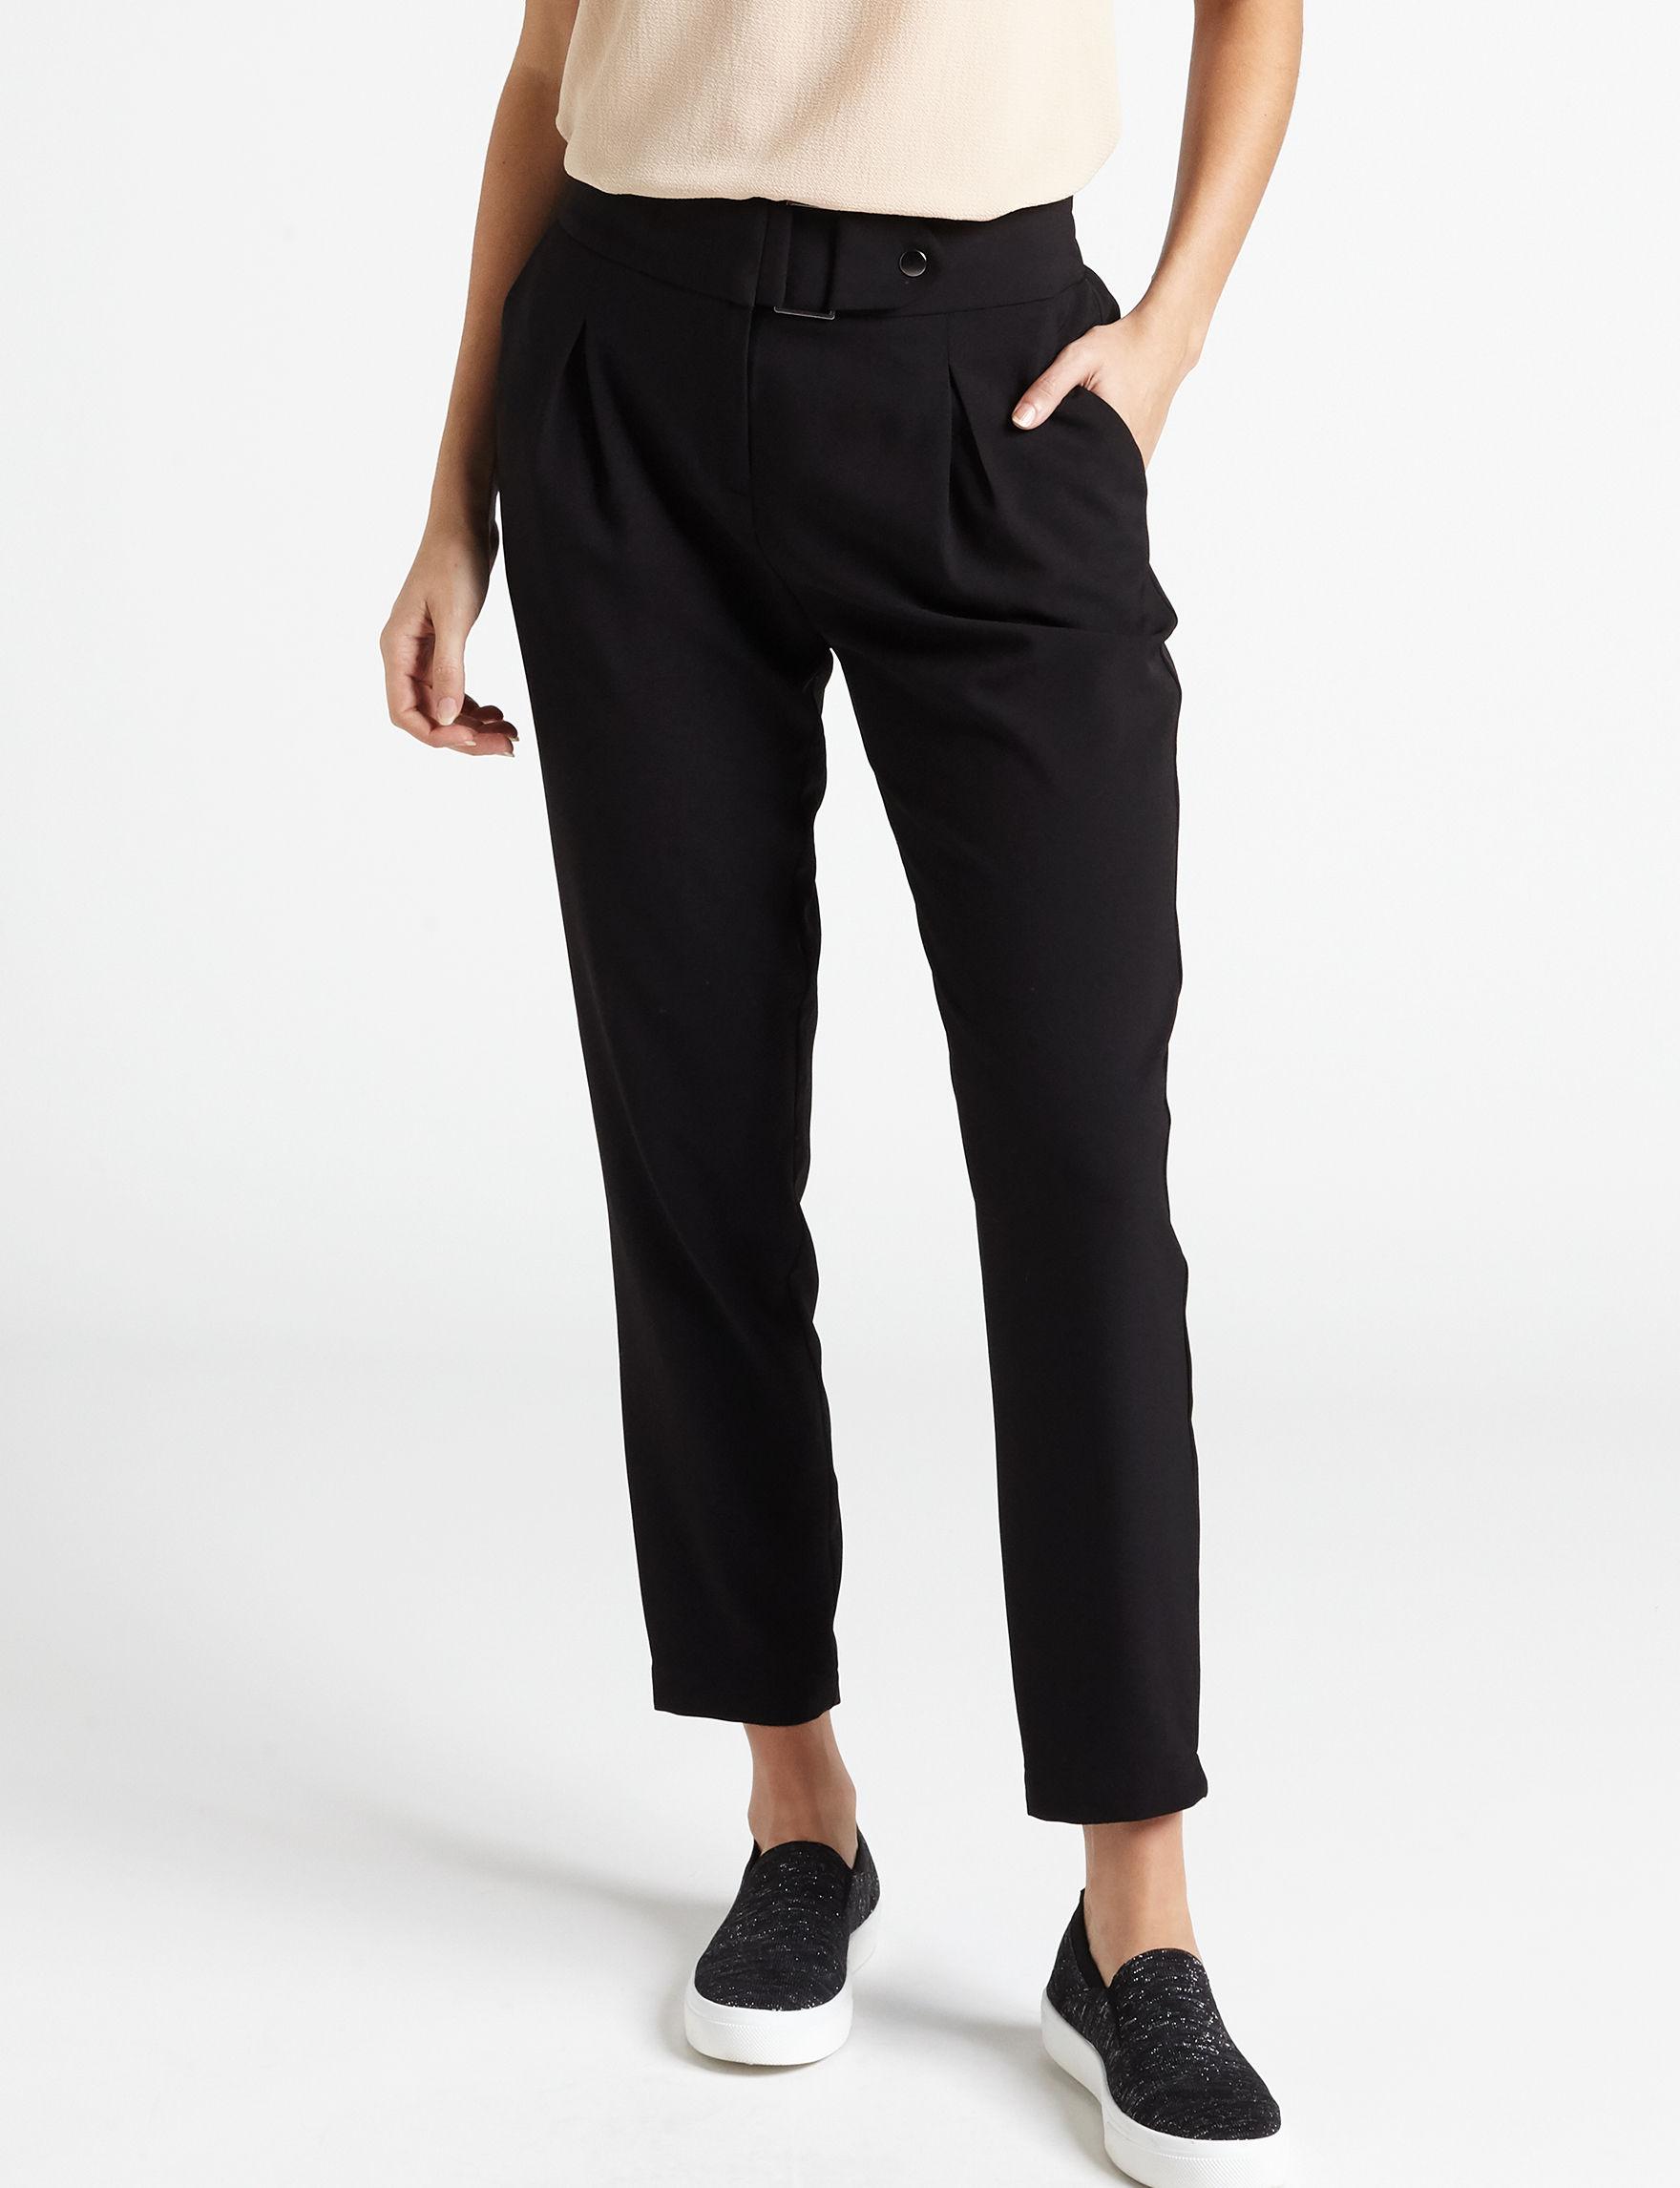 BeBop Black Soft Pants